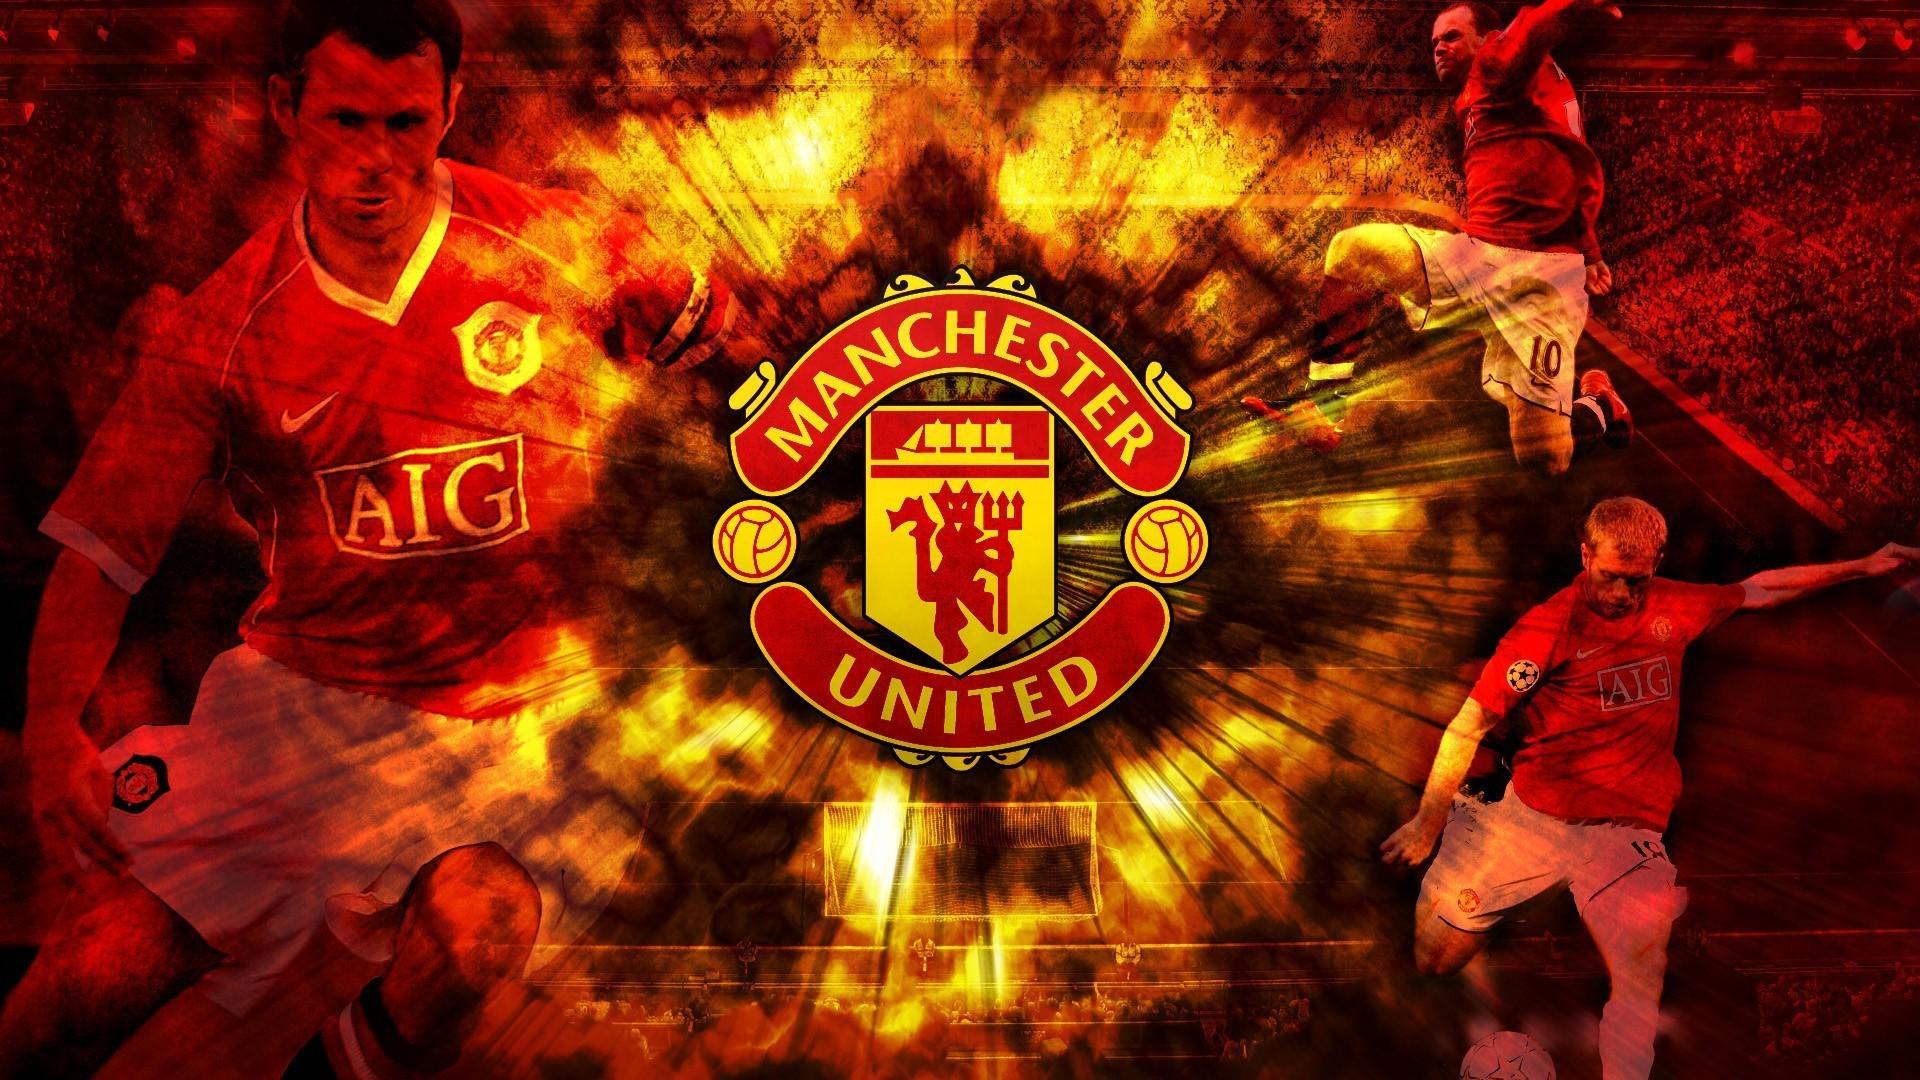 Manchester United Background